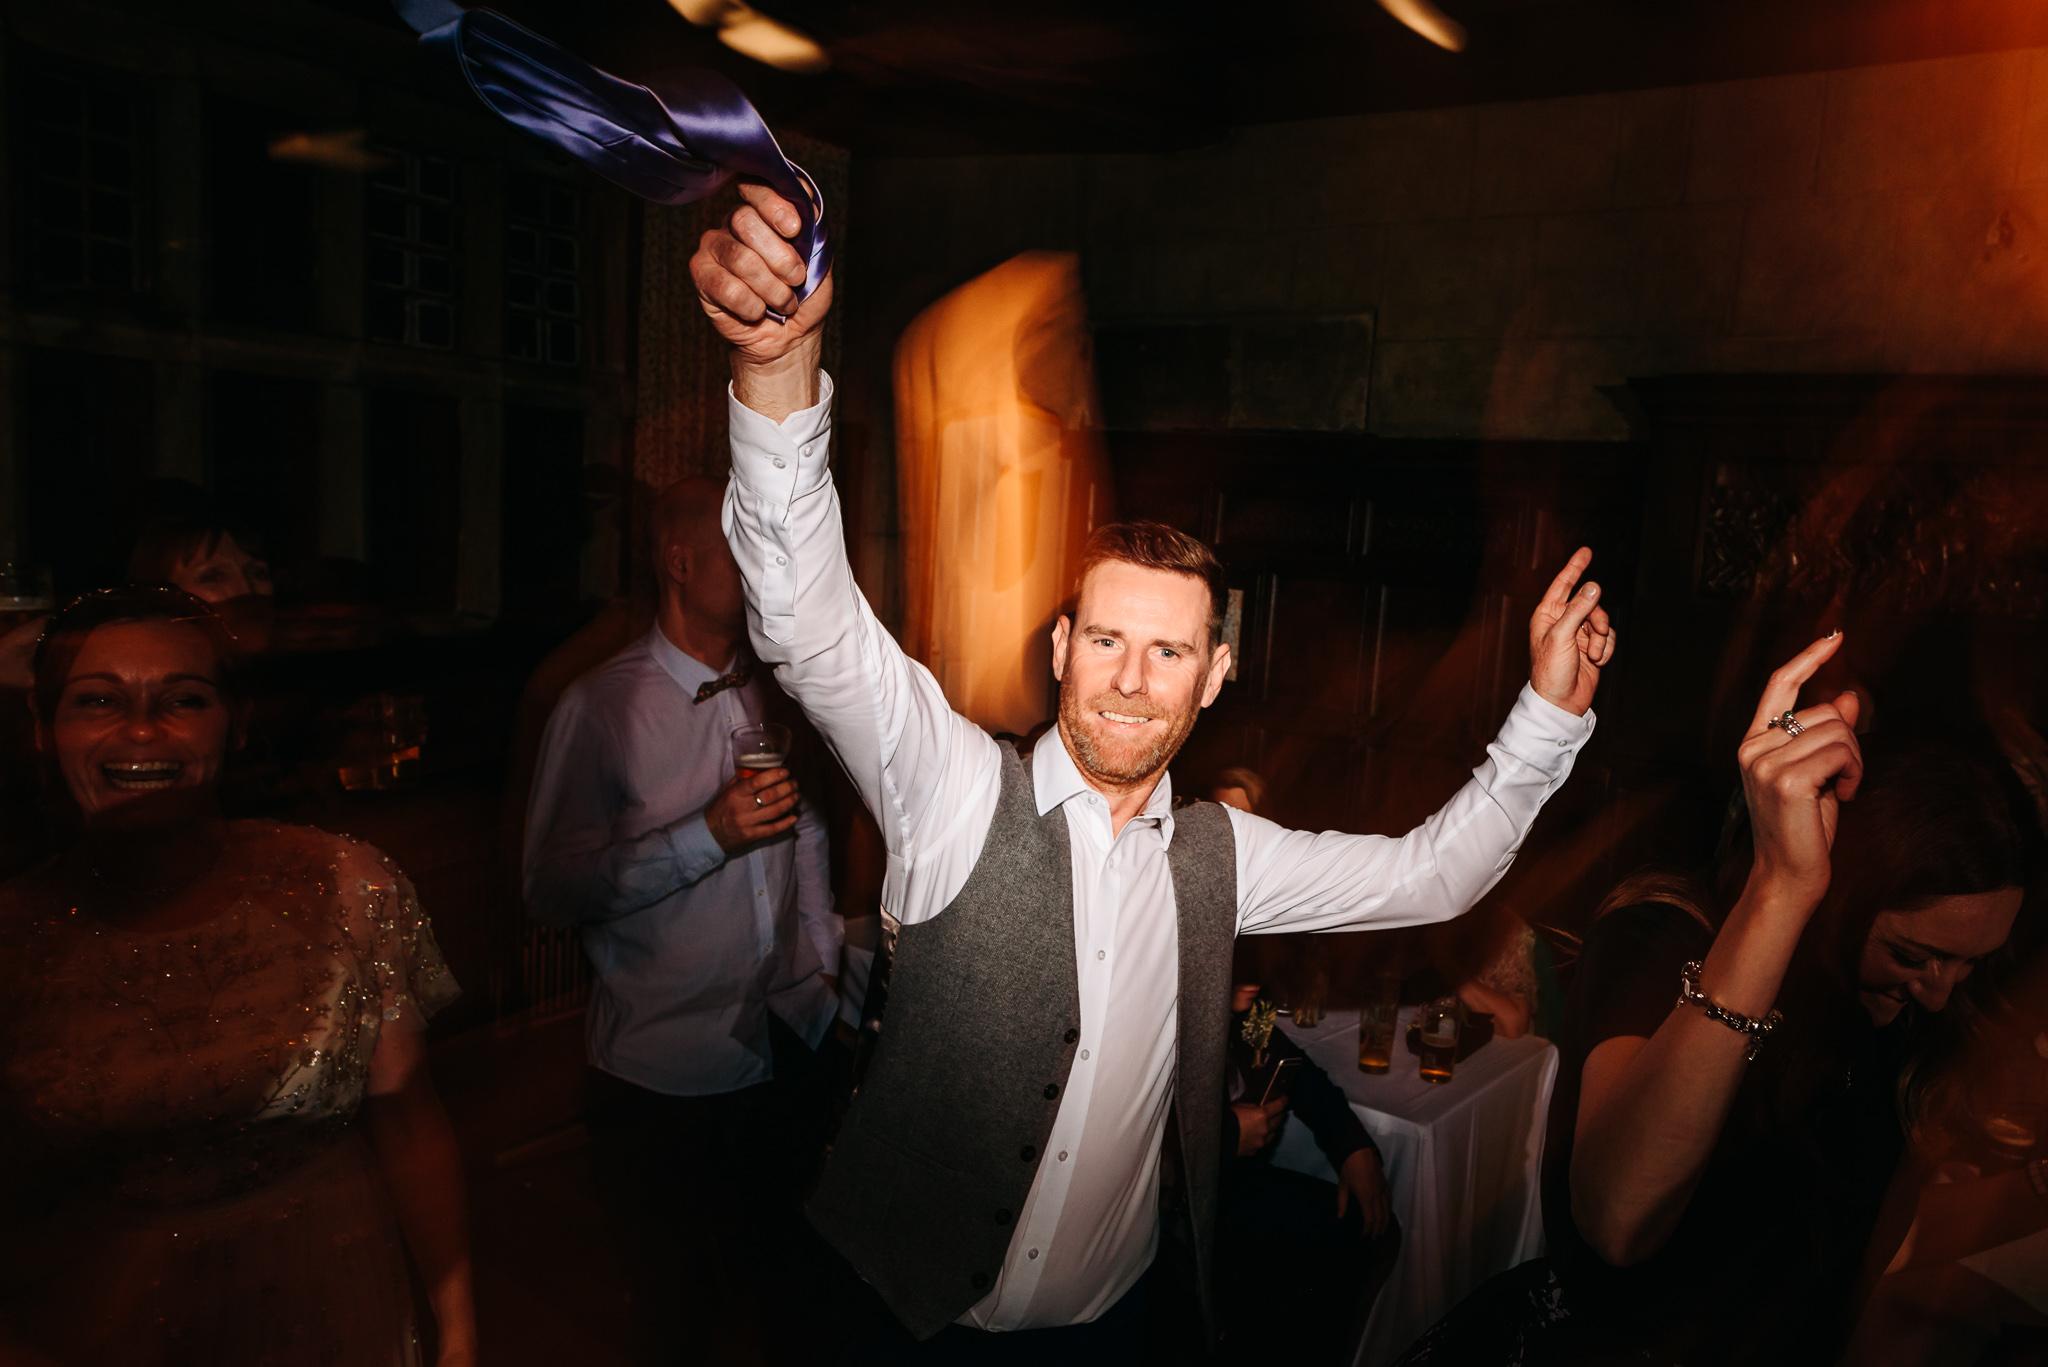 Best Of Yorkshire Wedding Photography 2017 - Martyn Hand-29.jpg